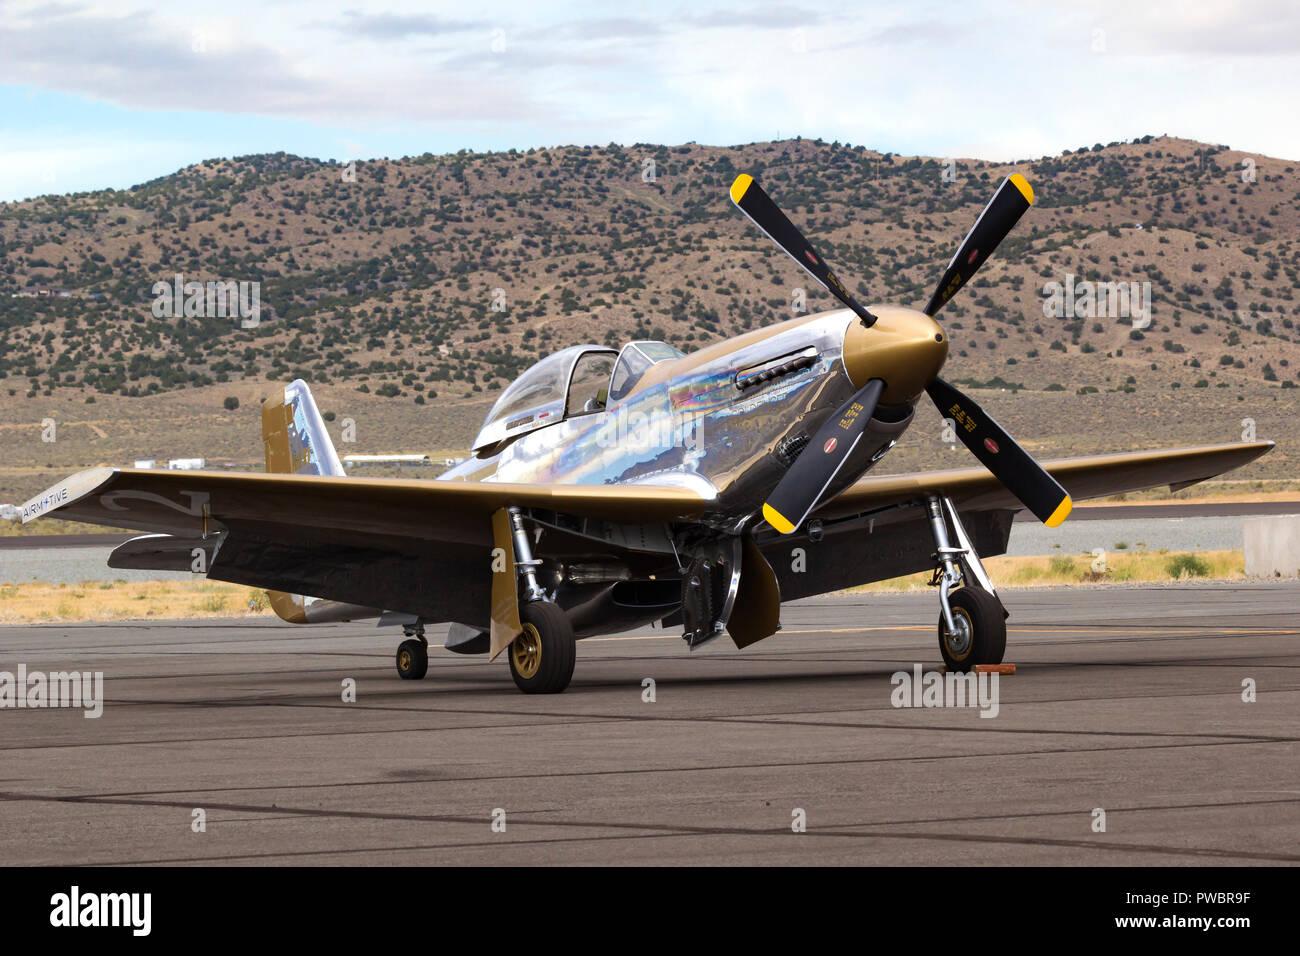 Reno Air Races Stock Photos & Reno Air Races Stock Images - Alamy